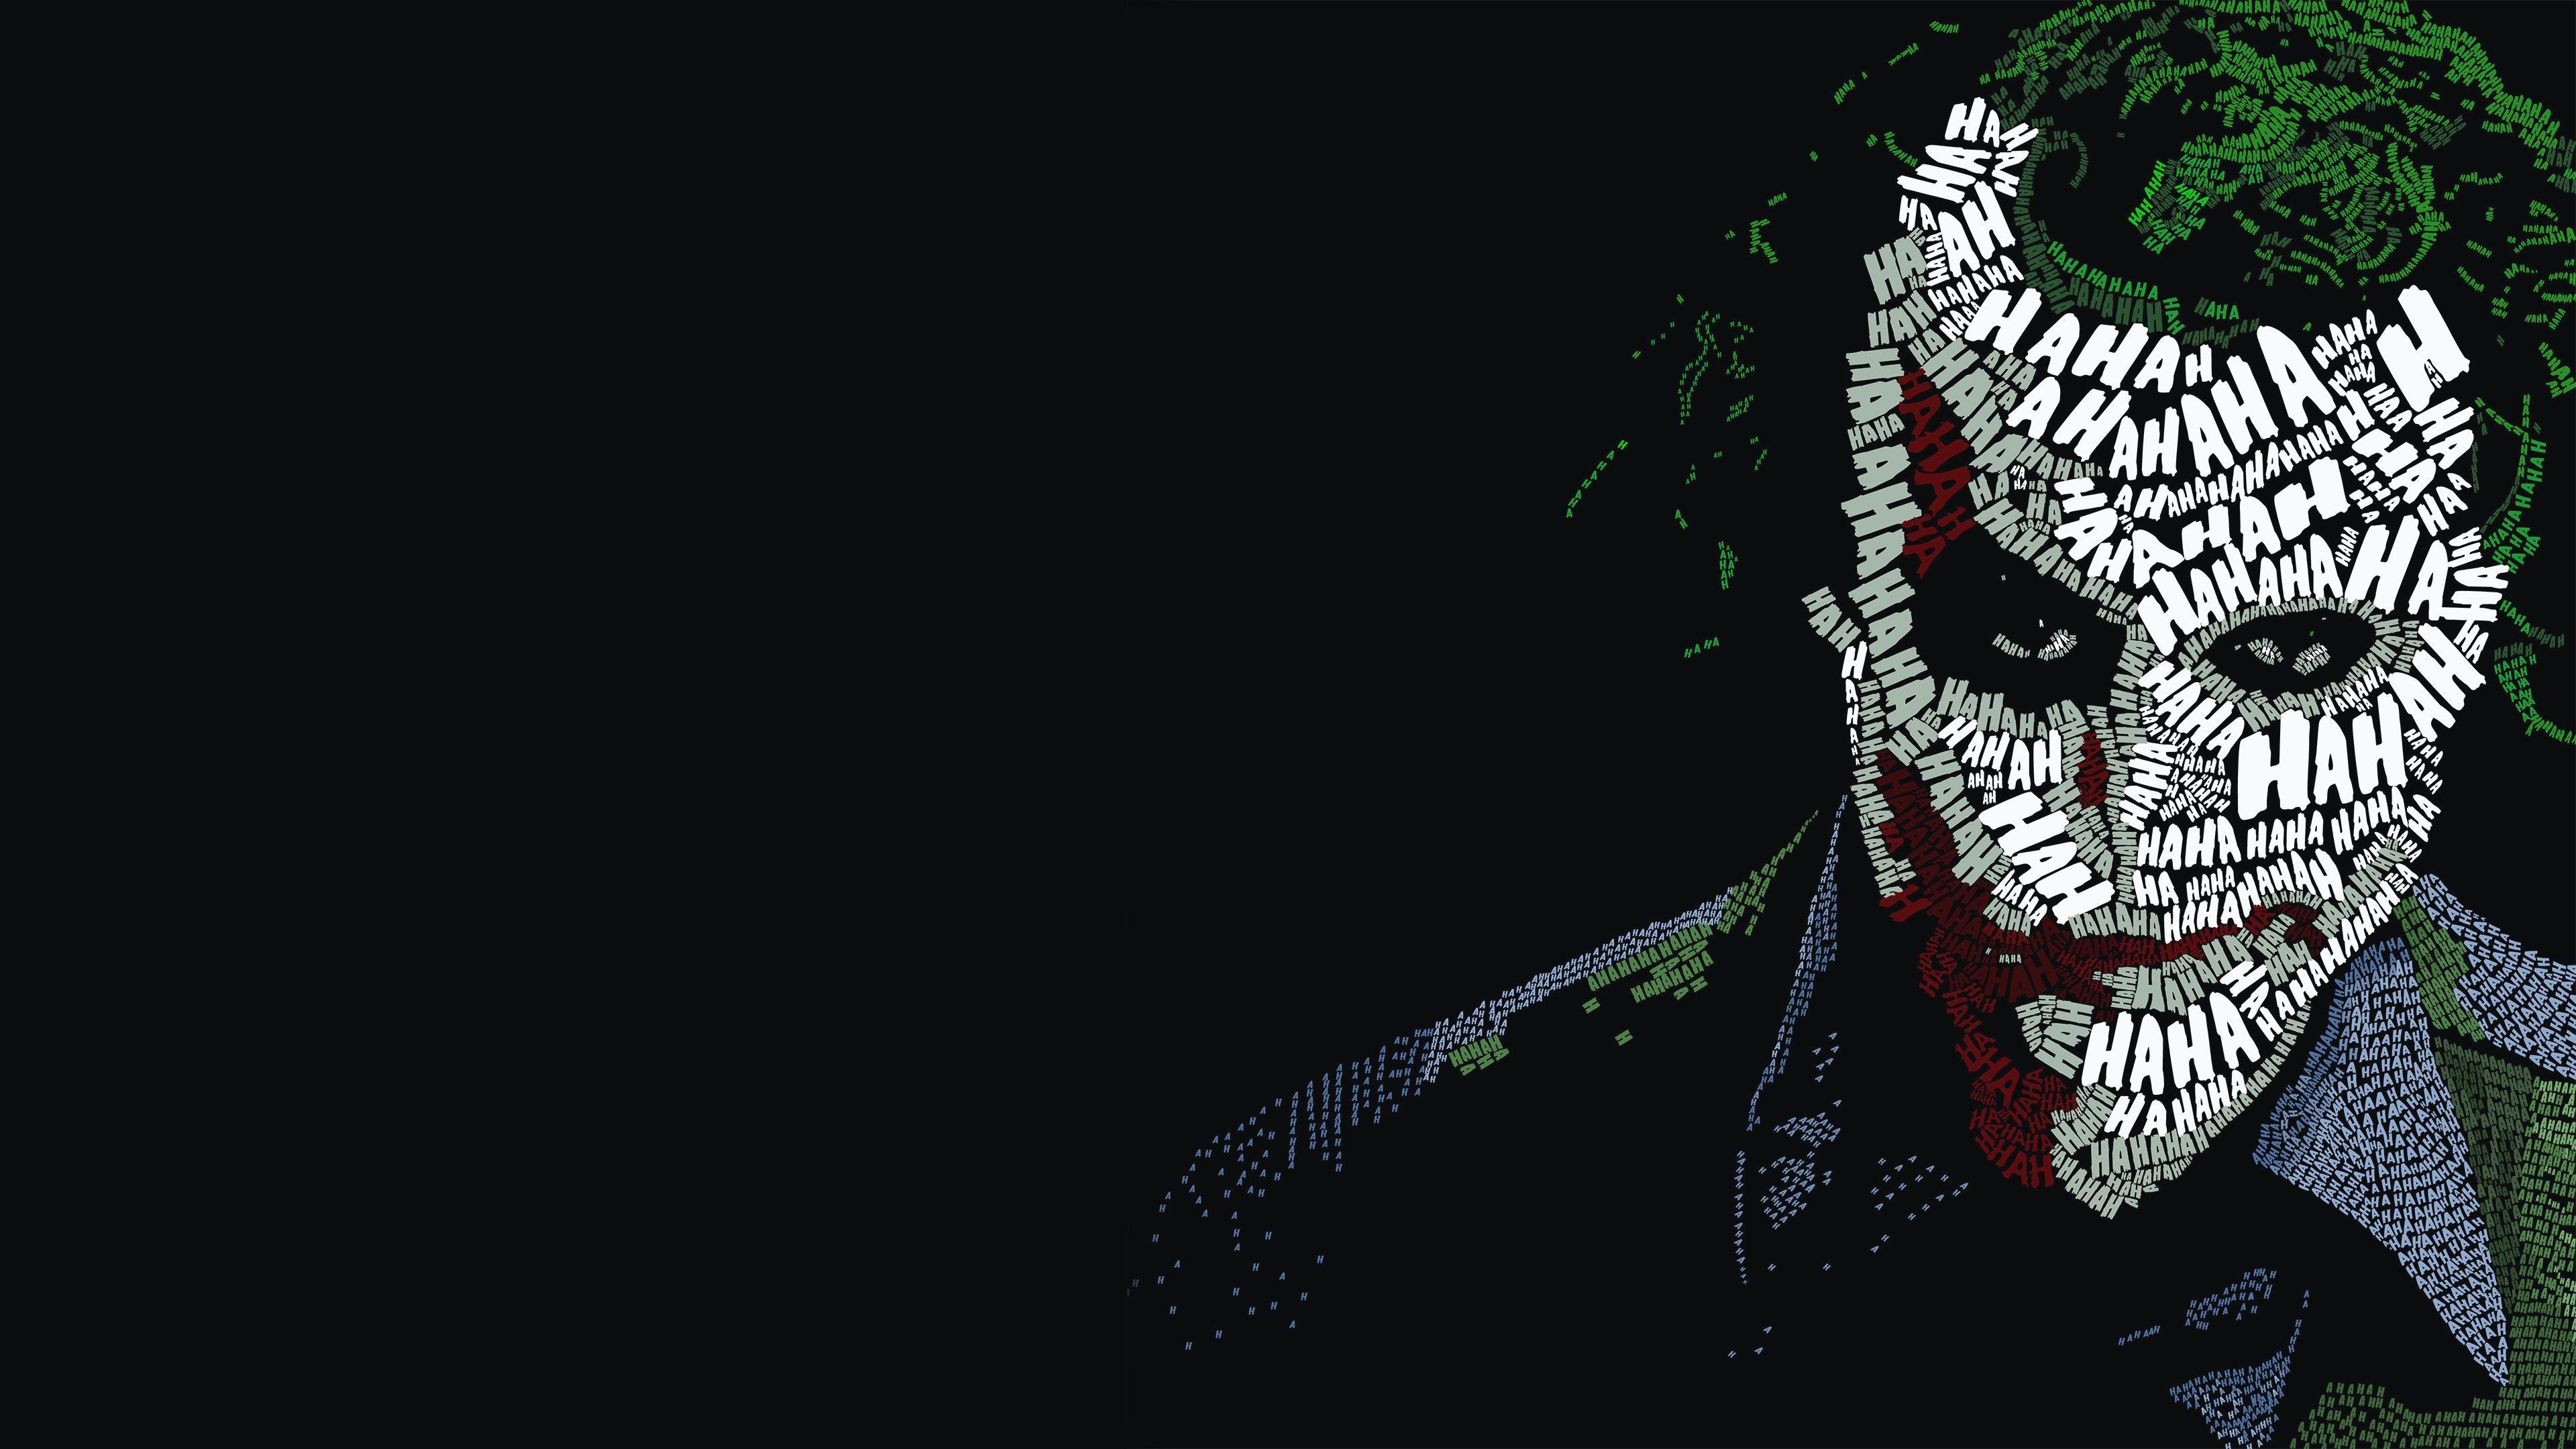 Joker Typography Hd Superheroes 4k Wallpapers Gambar